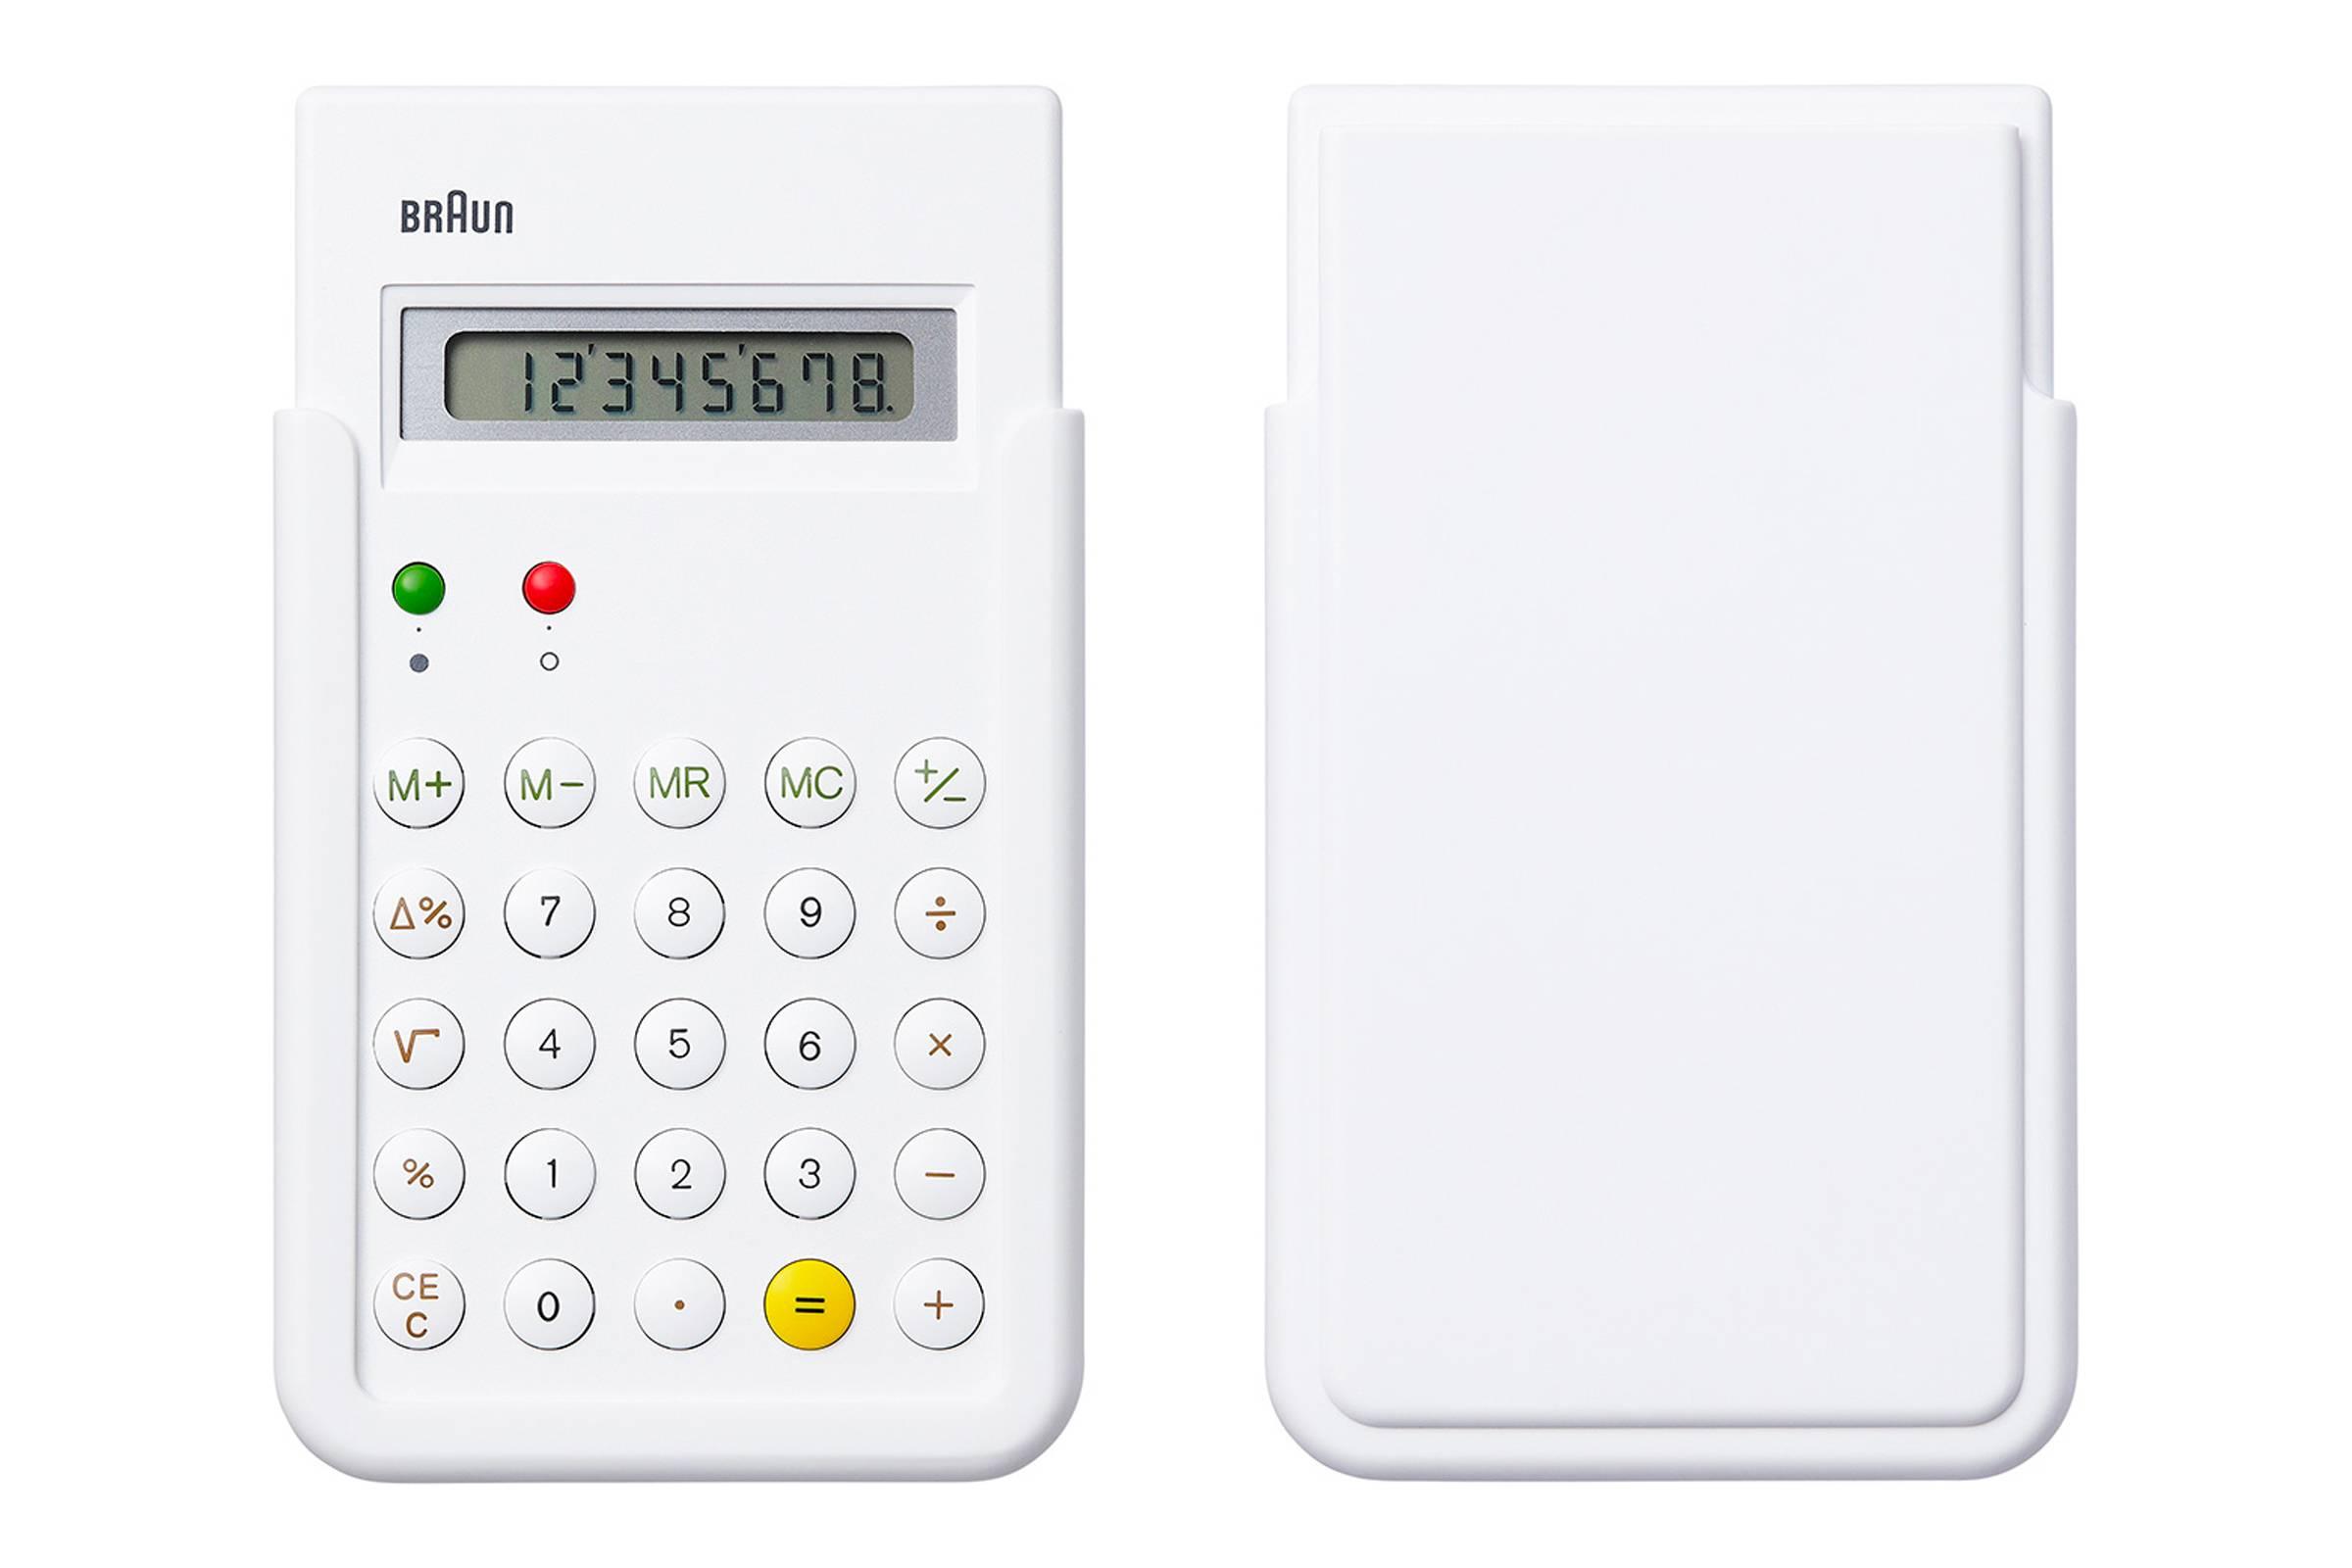 Supreme x Braun ET66 Calculator (Fall/Winter 2015)